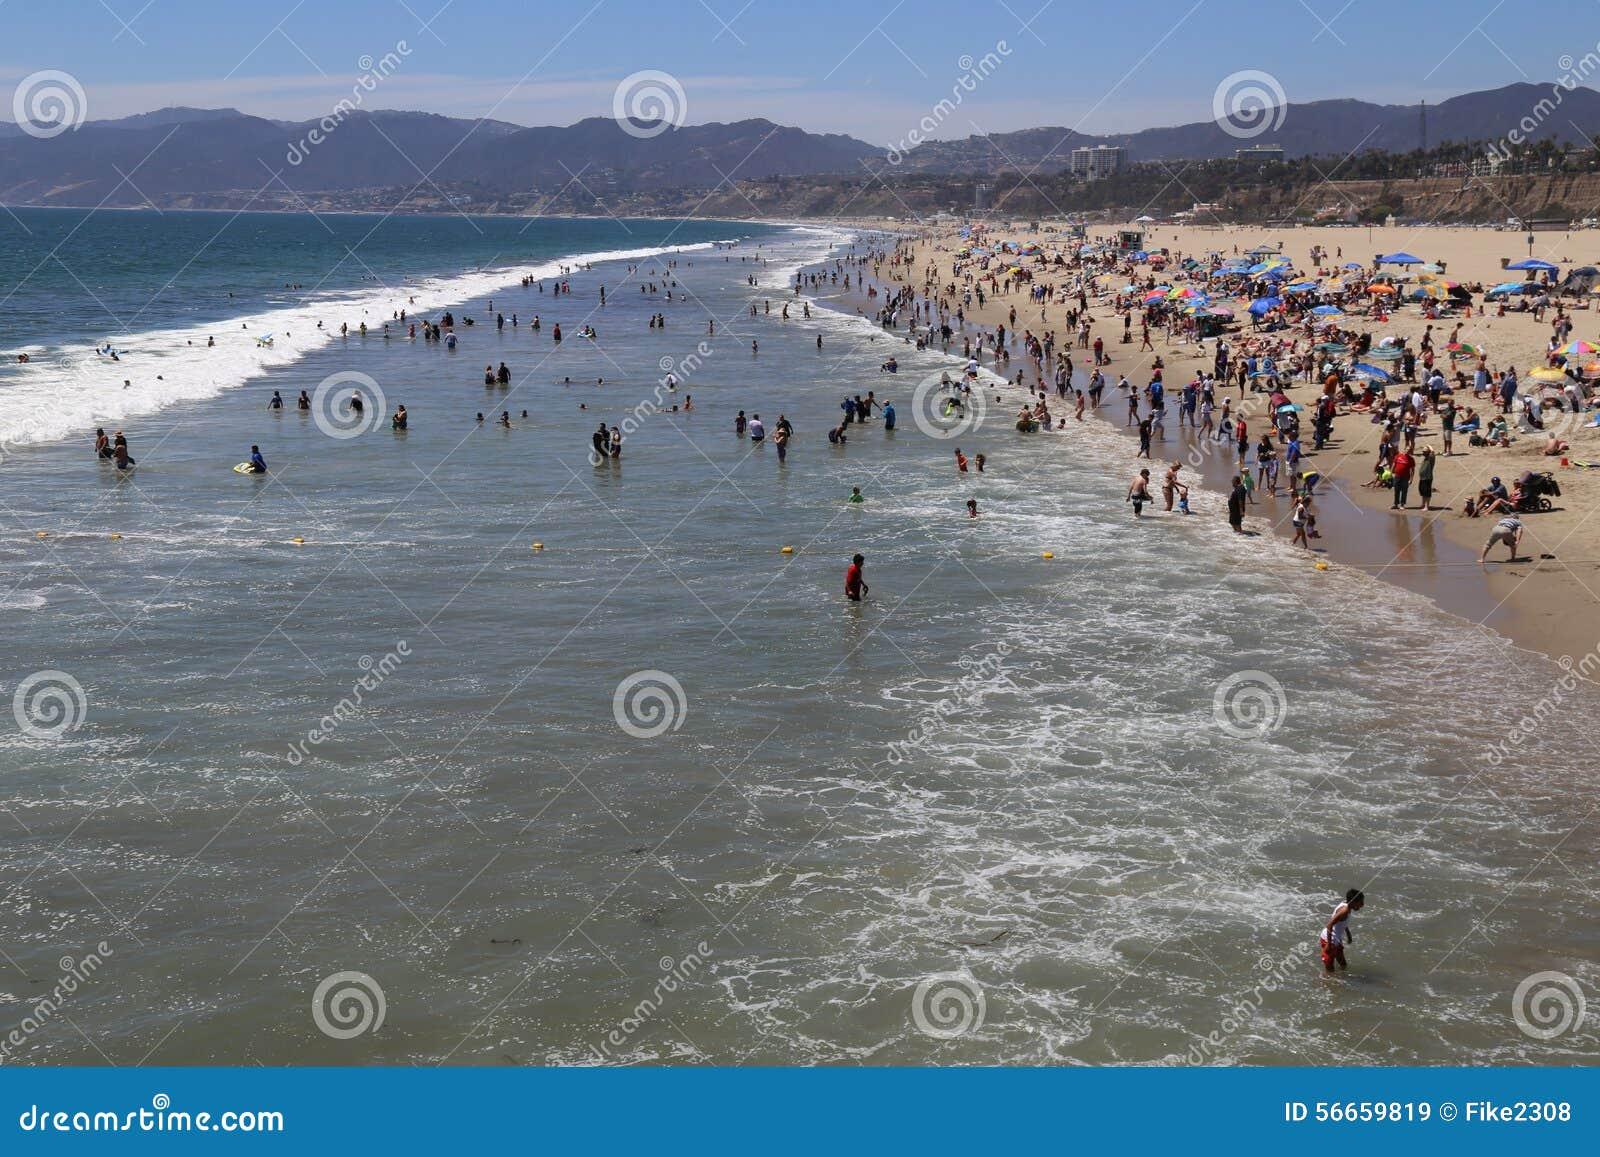 Summer In Santa Monica Editorial Stock Image - Image: 56659819